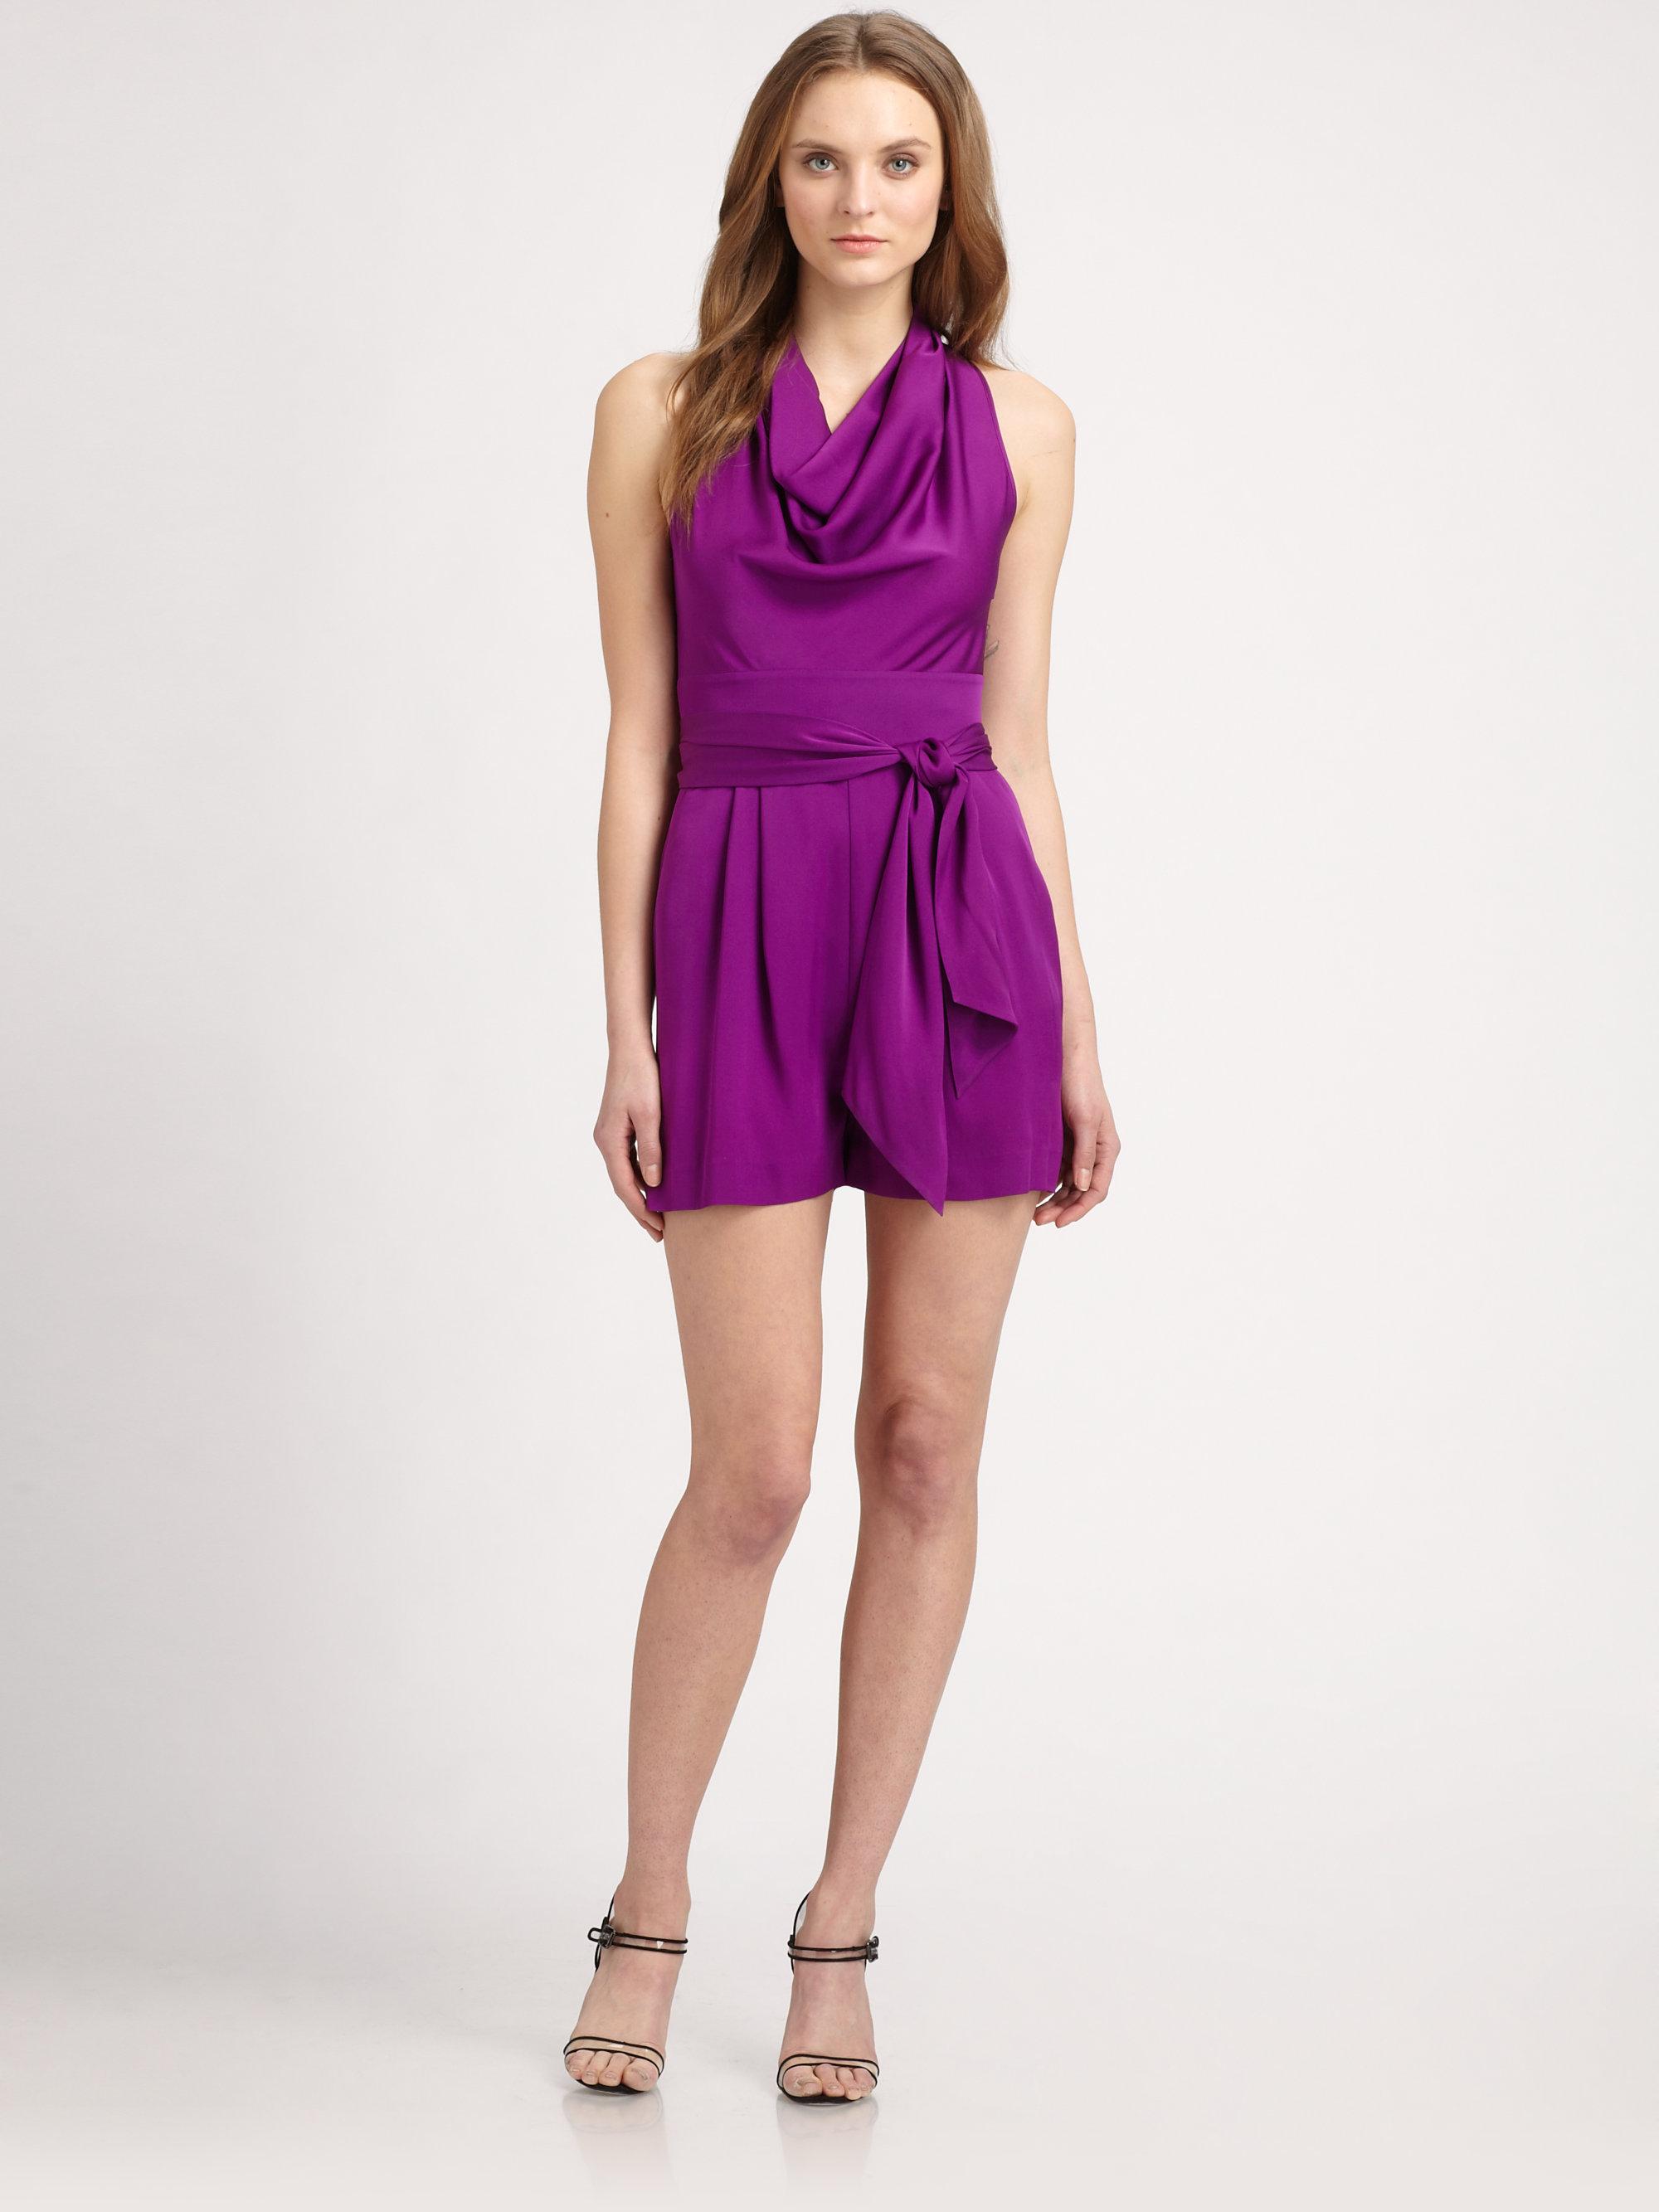 Lyst - Catherine Malandrino Belted Short Jumpsuit in Purple